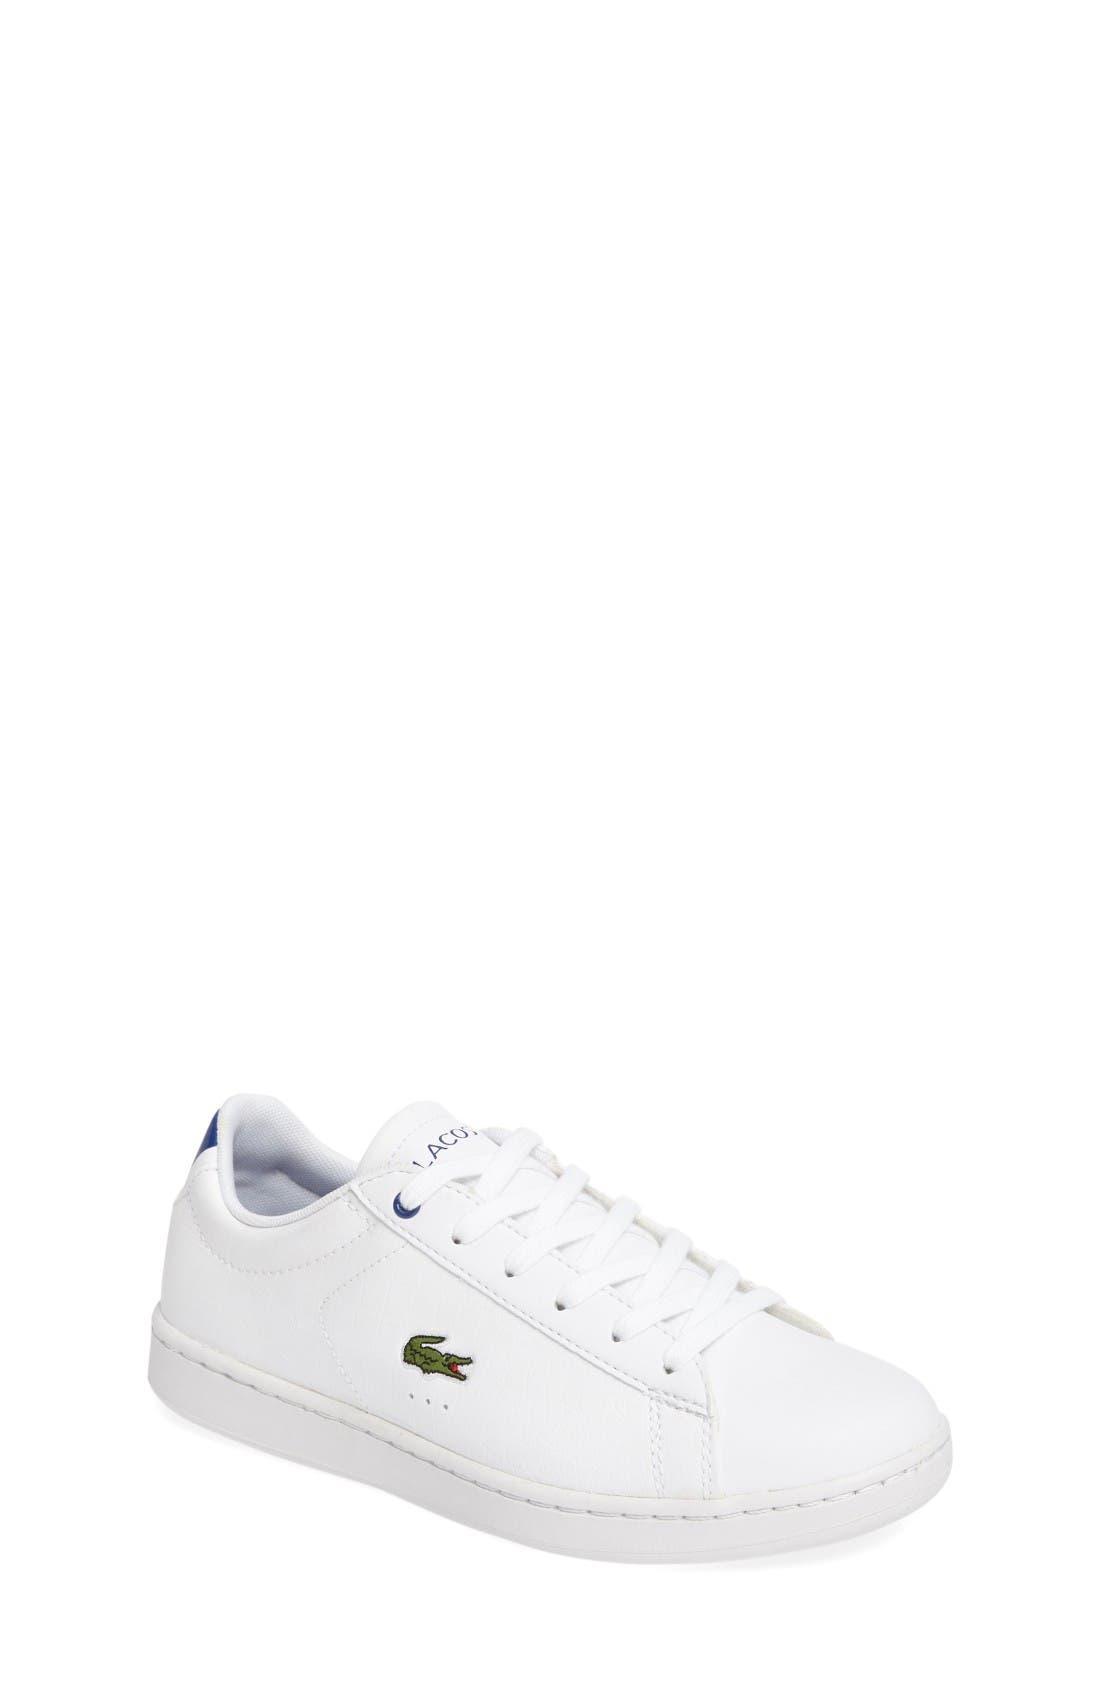 Carnaby EVO Sneaker,                             Main thumbnail 1, color,                             White/ Blue